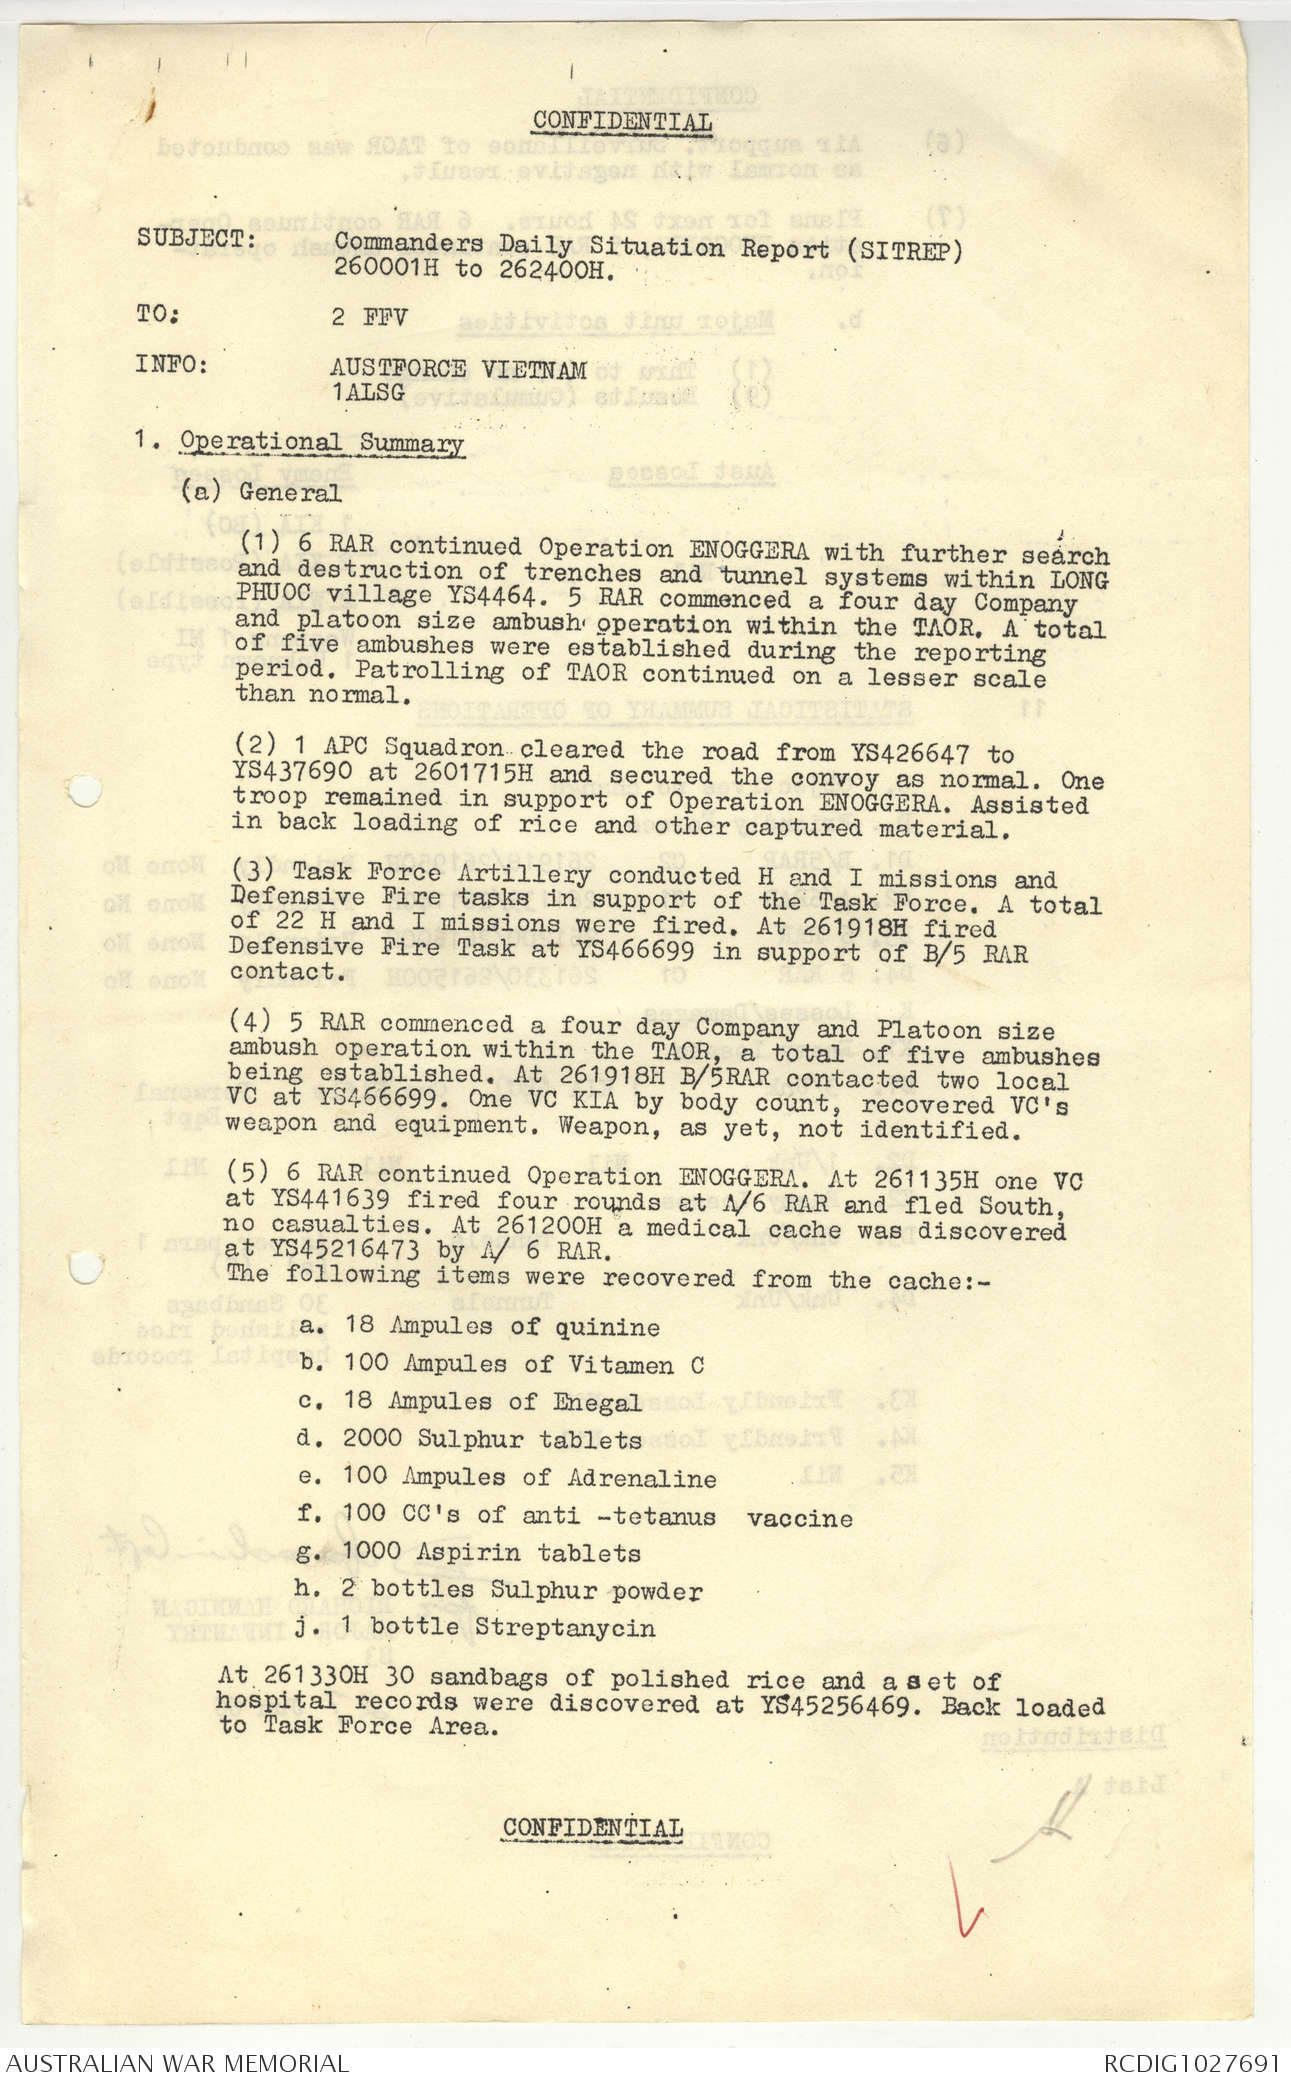 AWM95 2/6/3 - 1-31 July 1966, Narrative, Annexes, Summary